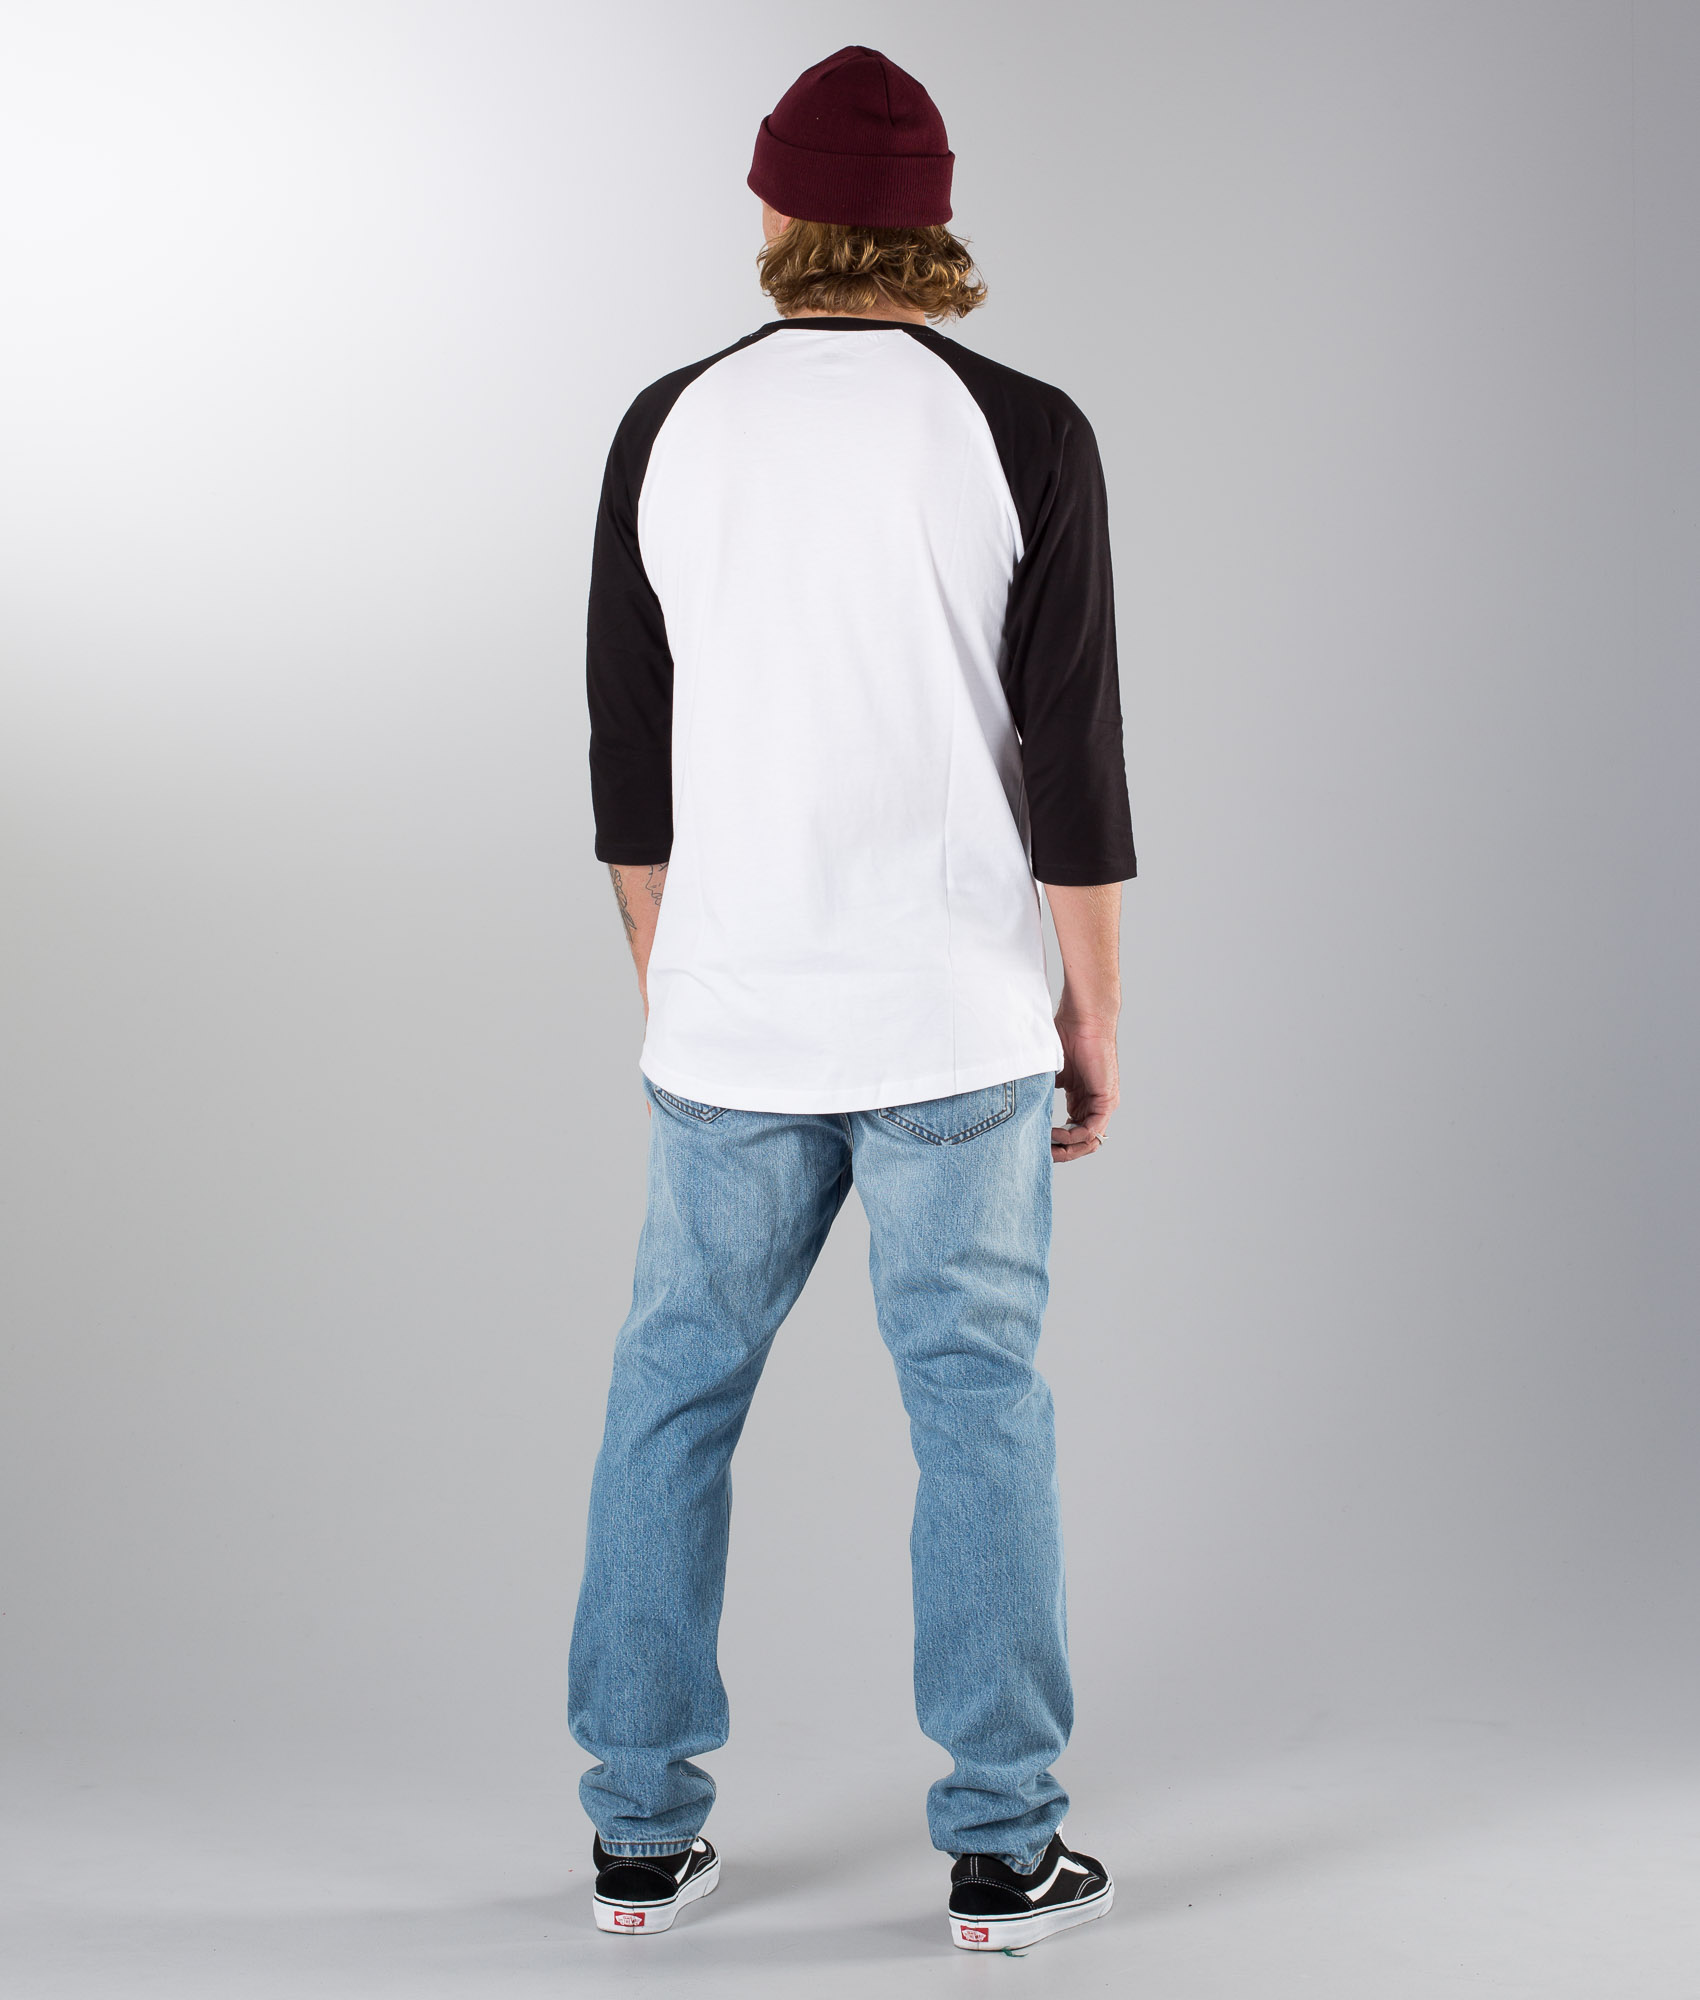 Vans Classic Raglan T shirt White Black Port Royale